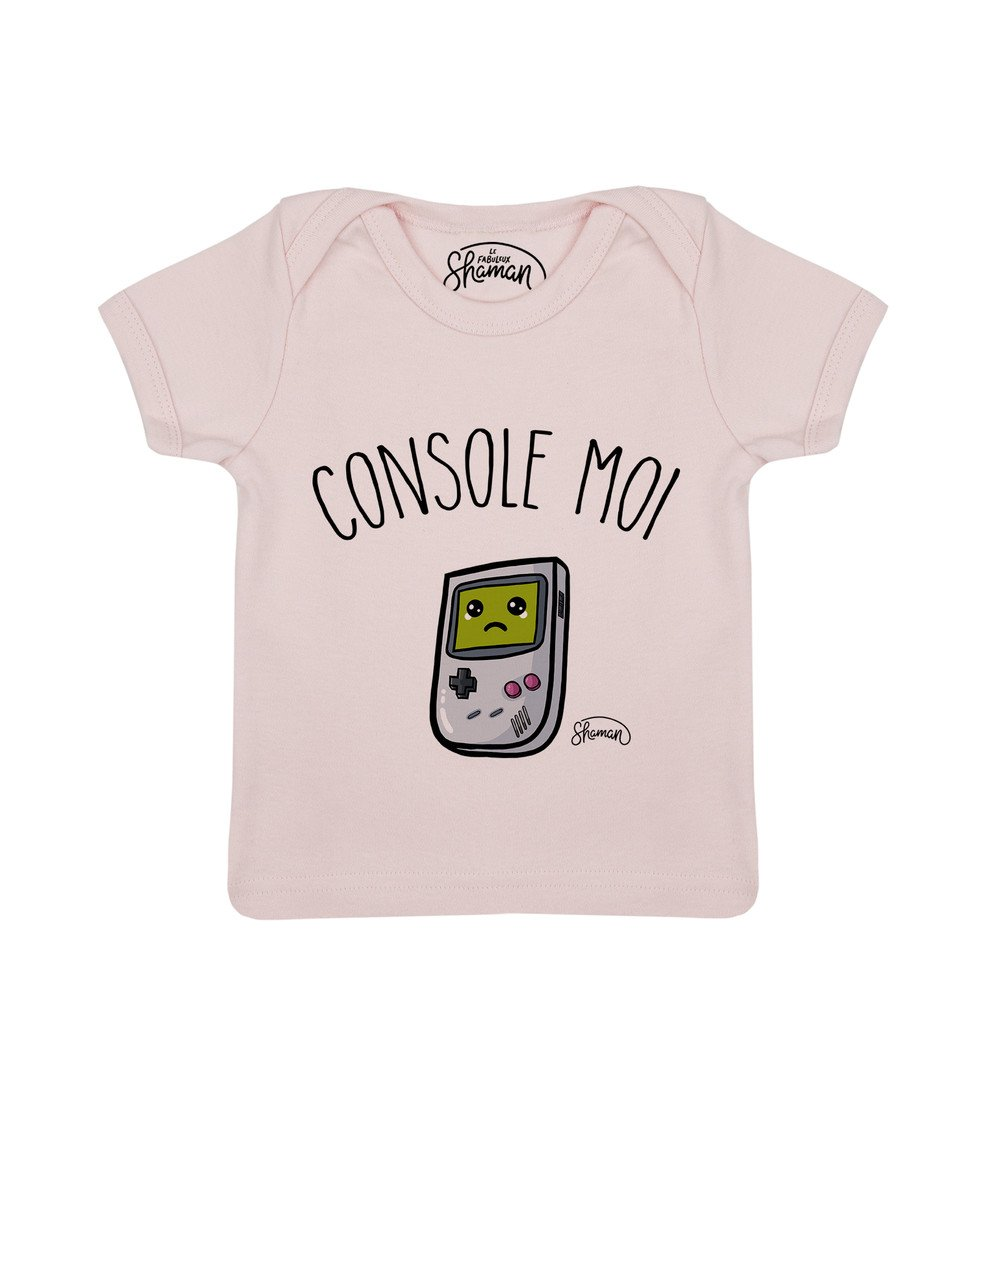 Tee shirt Console moi